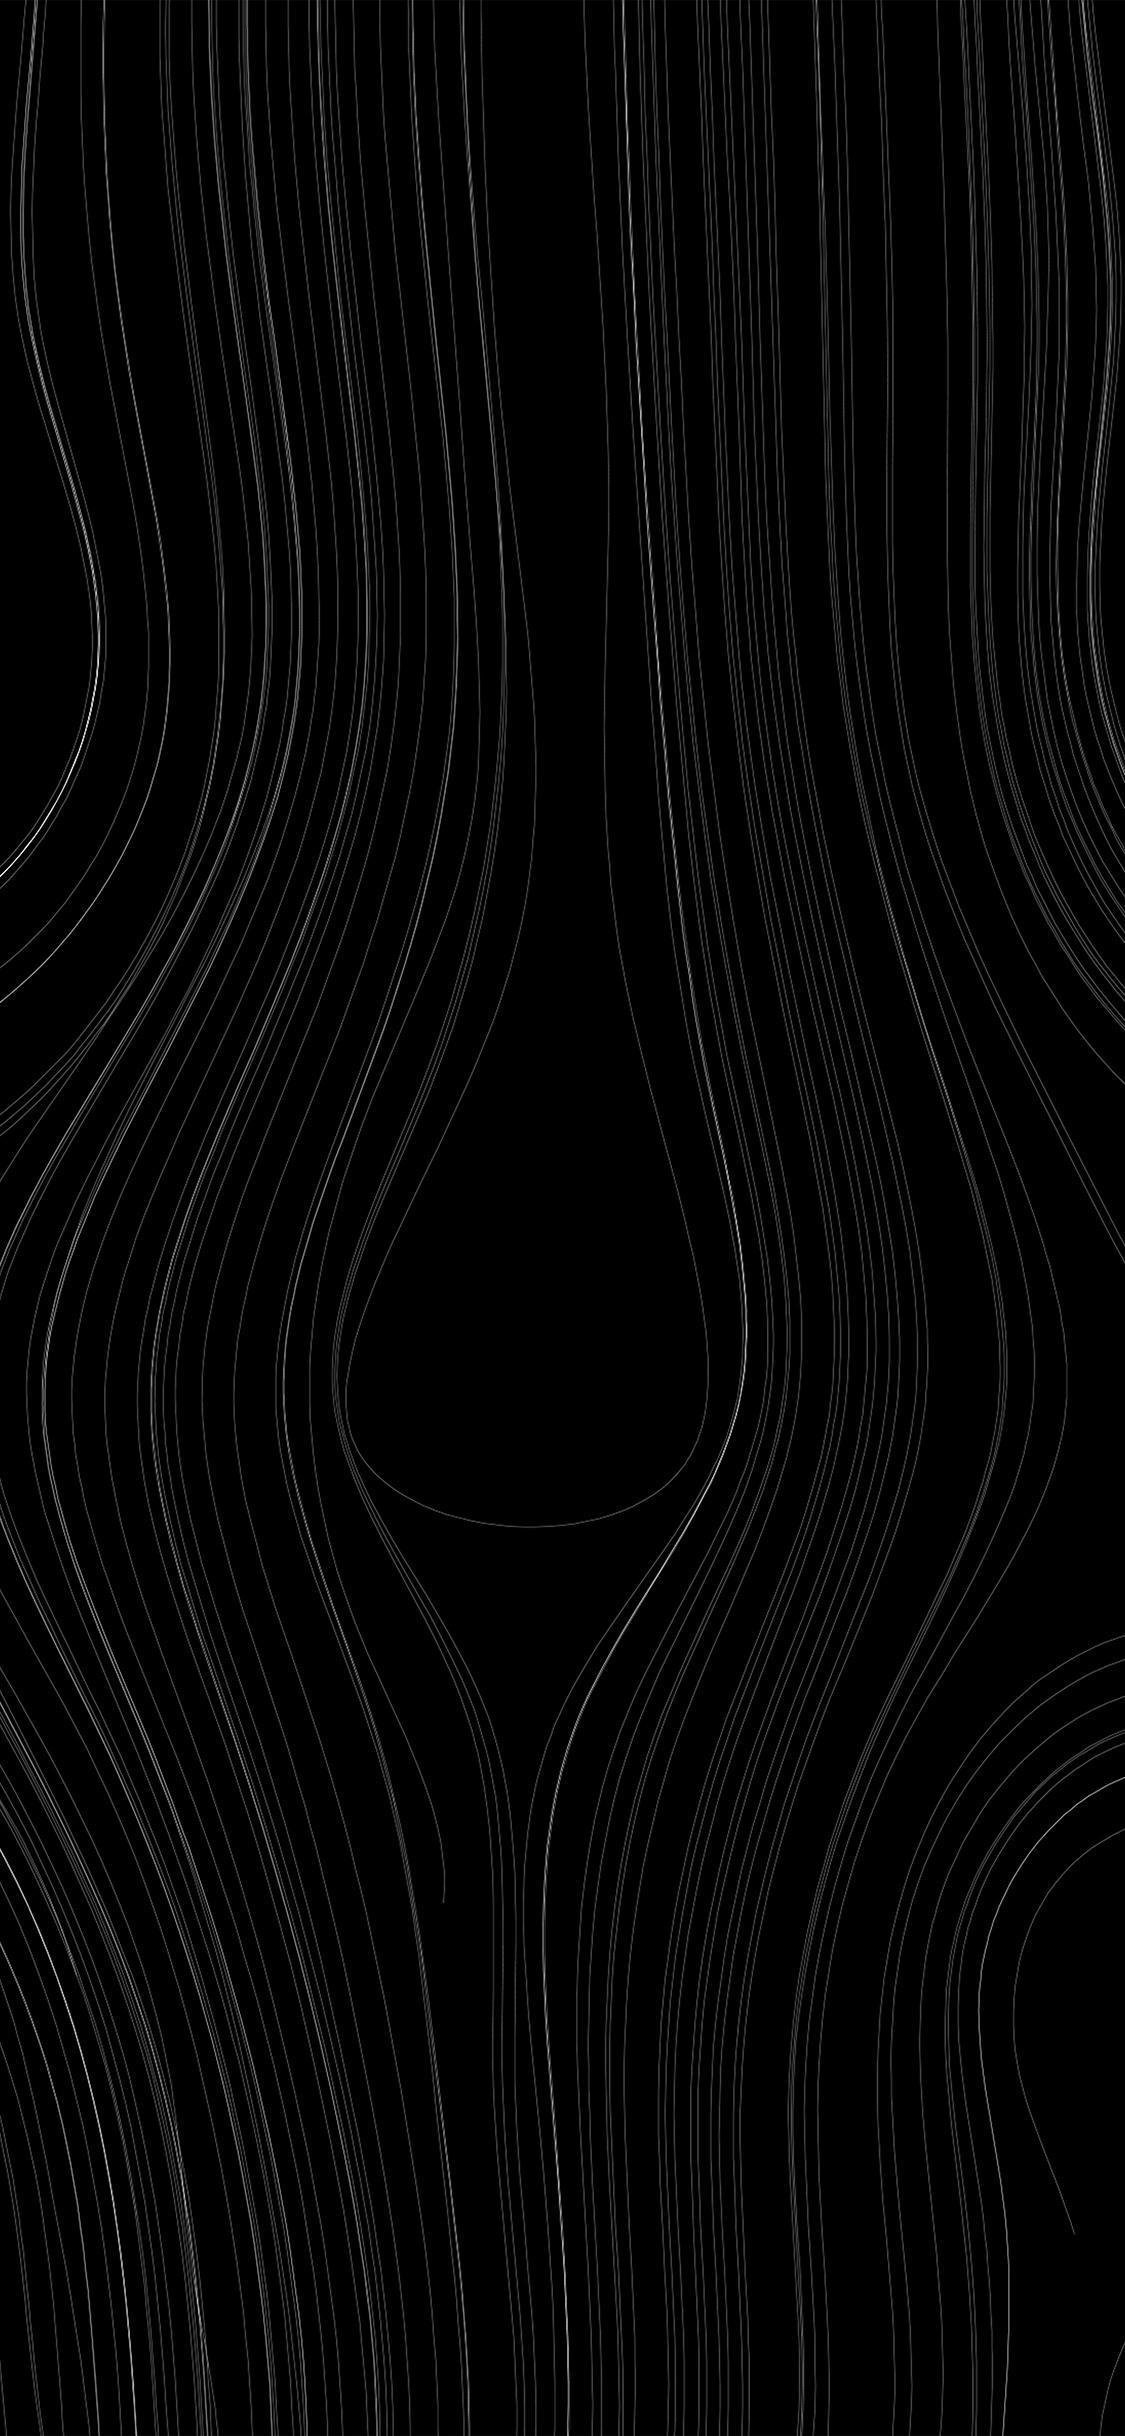 Dark 4k Iphone Wallpapers Top Free Dark 4k Iphone Backgrounds Wallpaperaccess